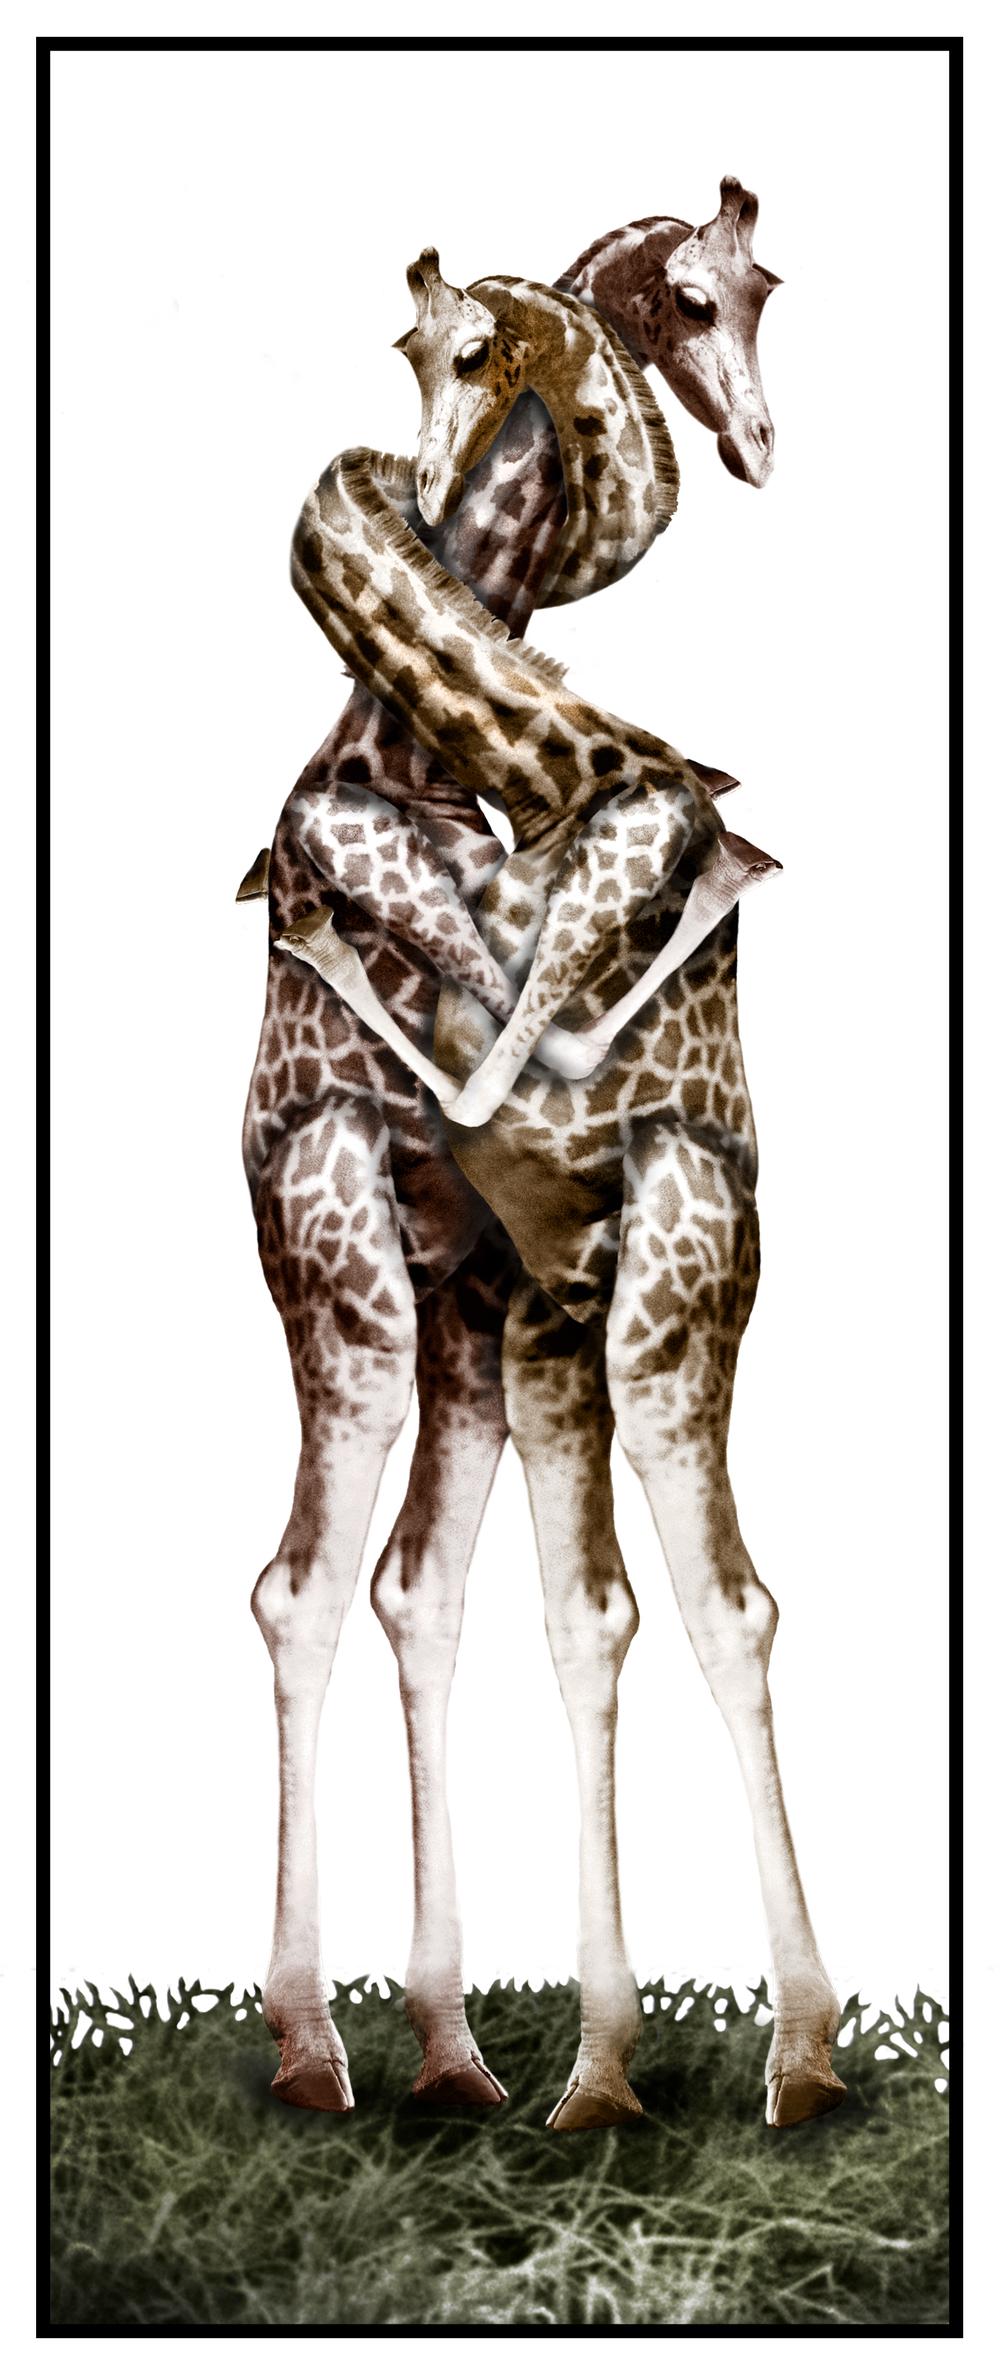 GiraffeHugCard.jpg